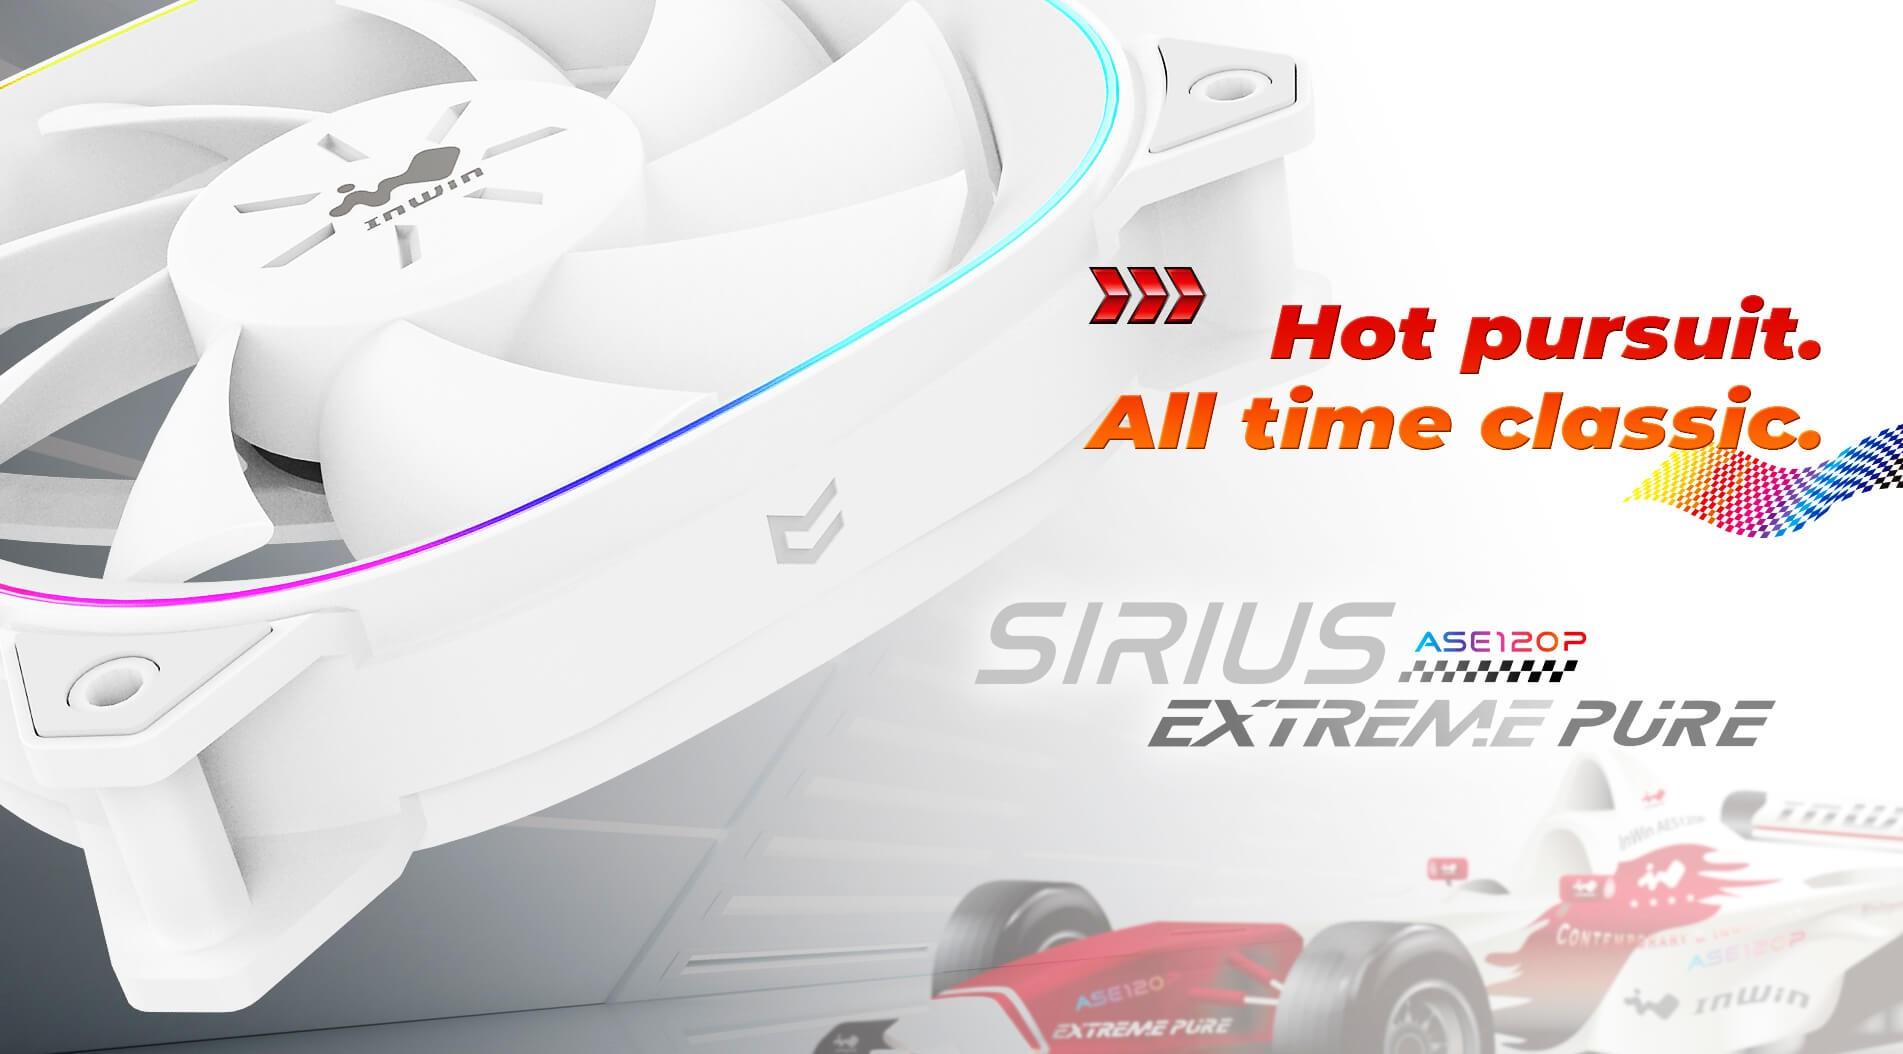 Sirius Extreme Pure ASE120P